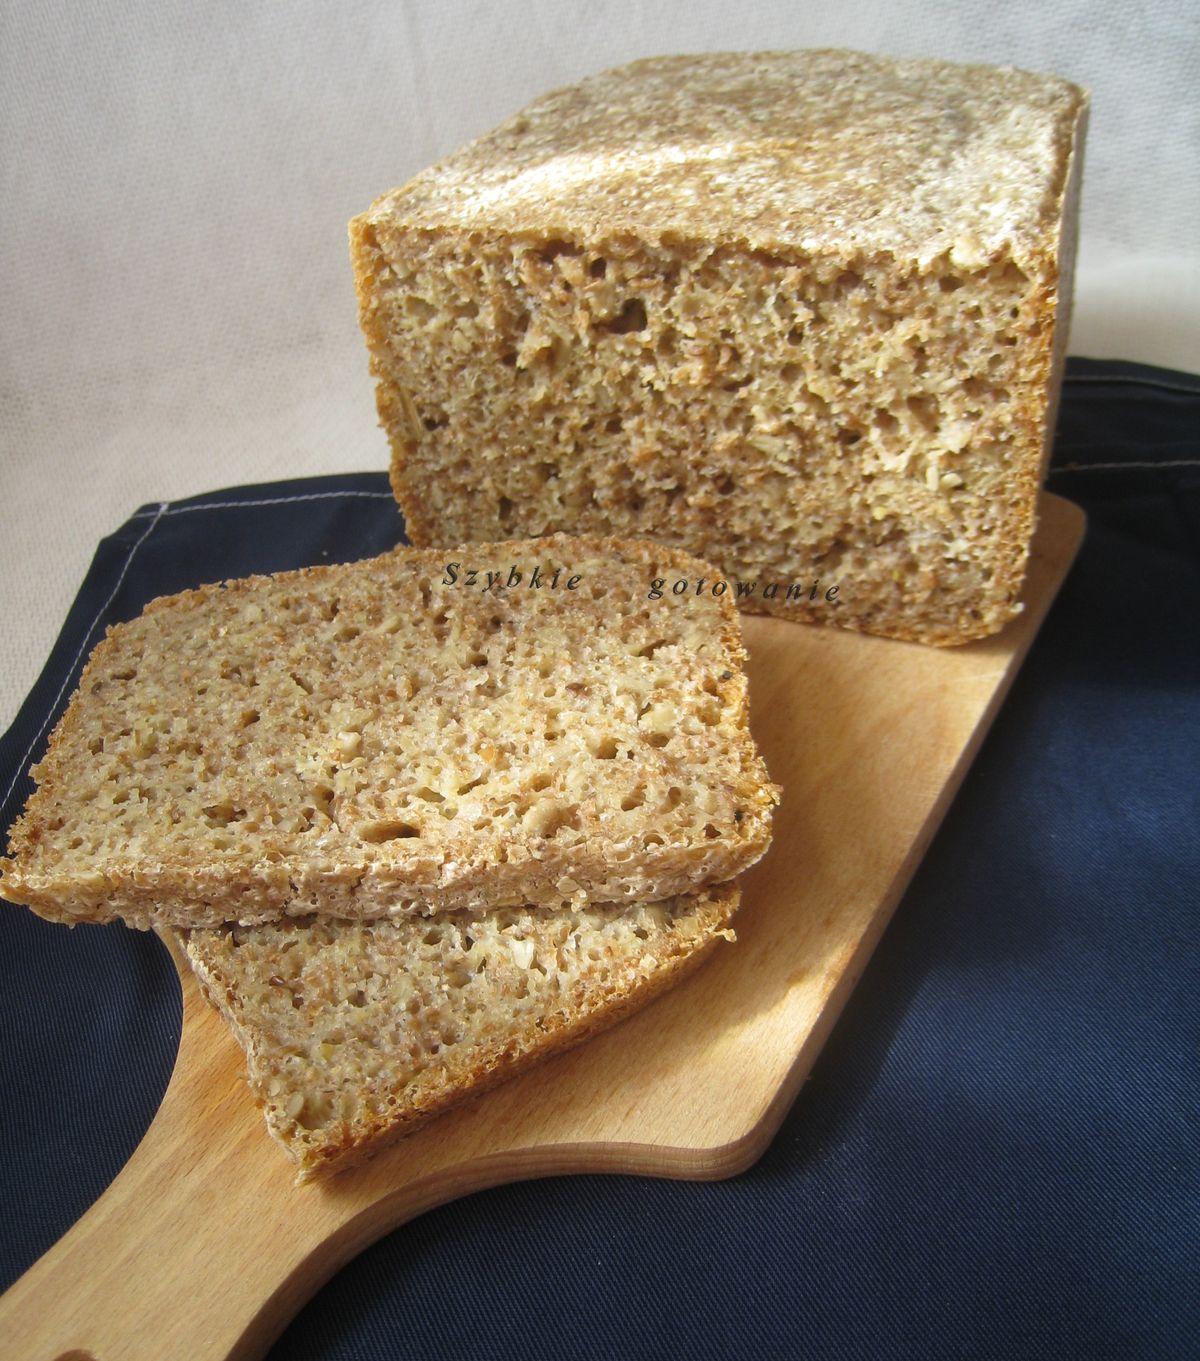 Pyszny chleb graham z ziarnami